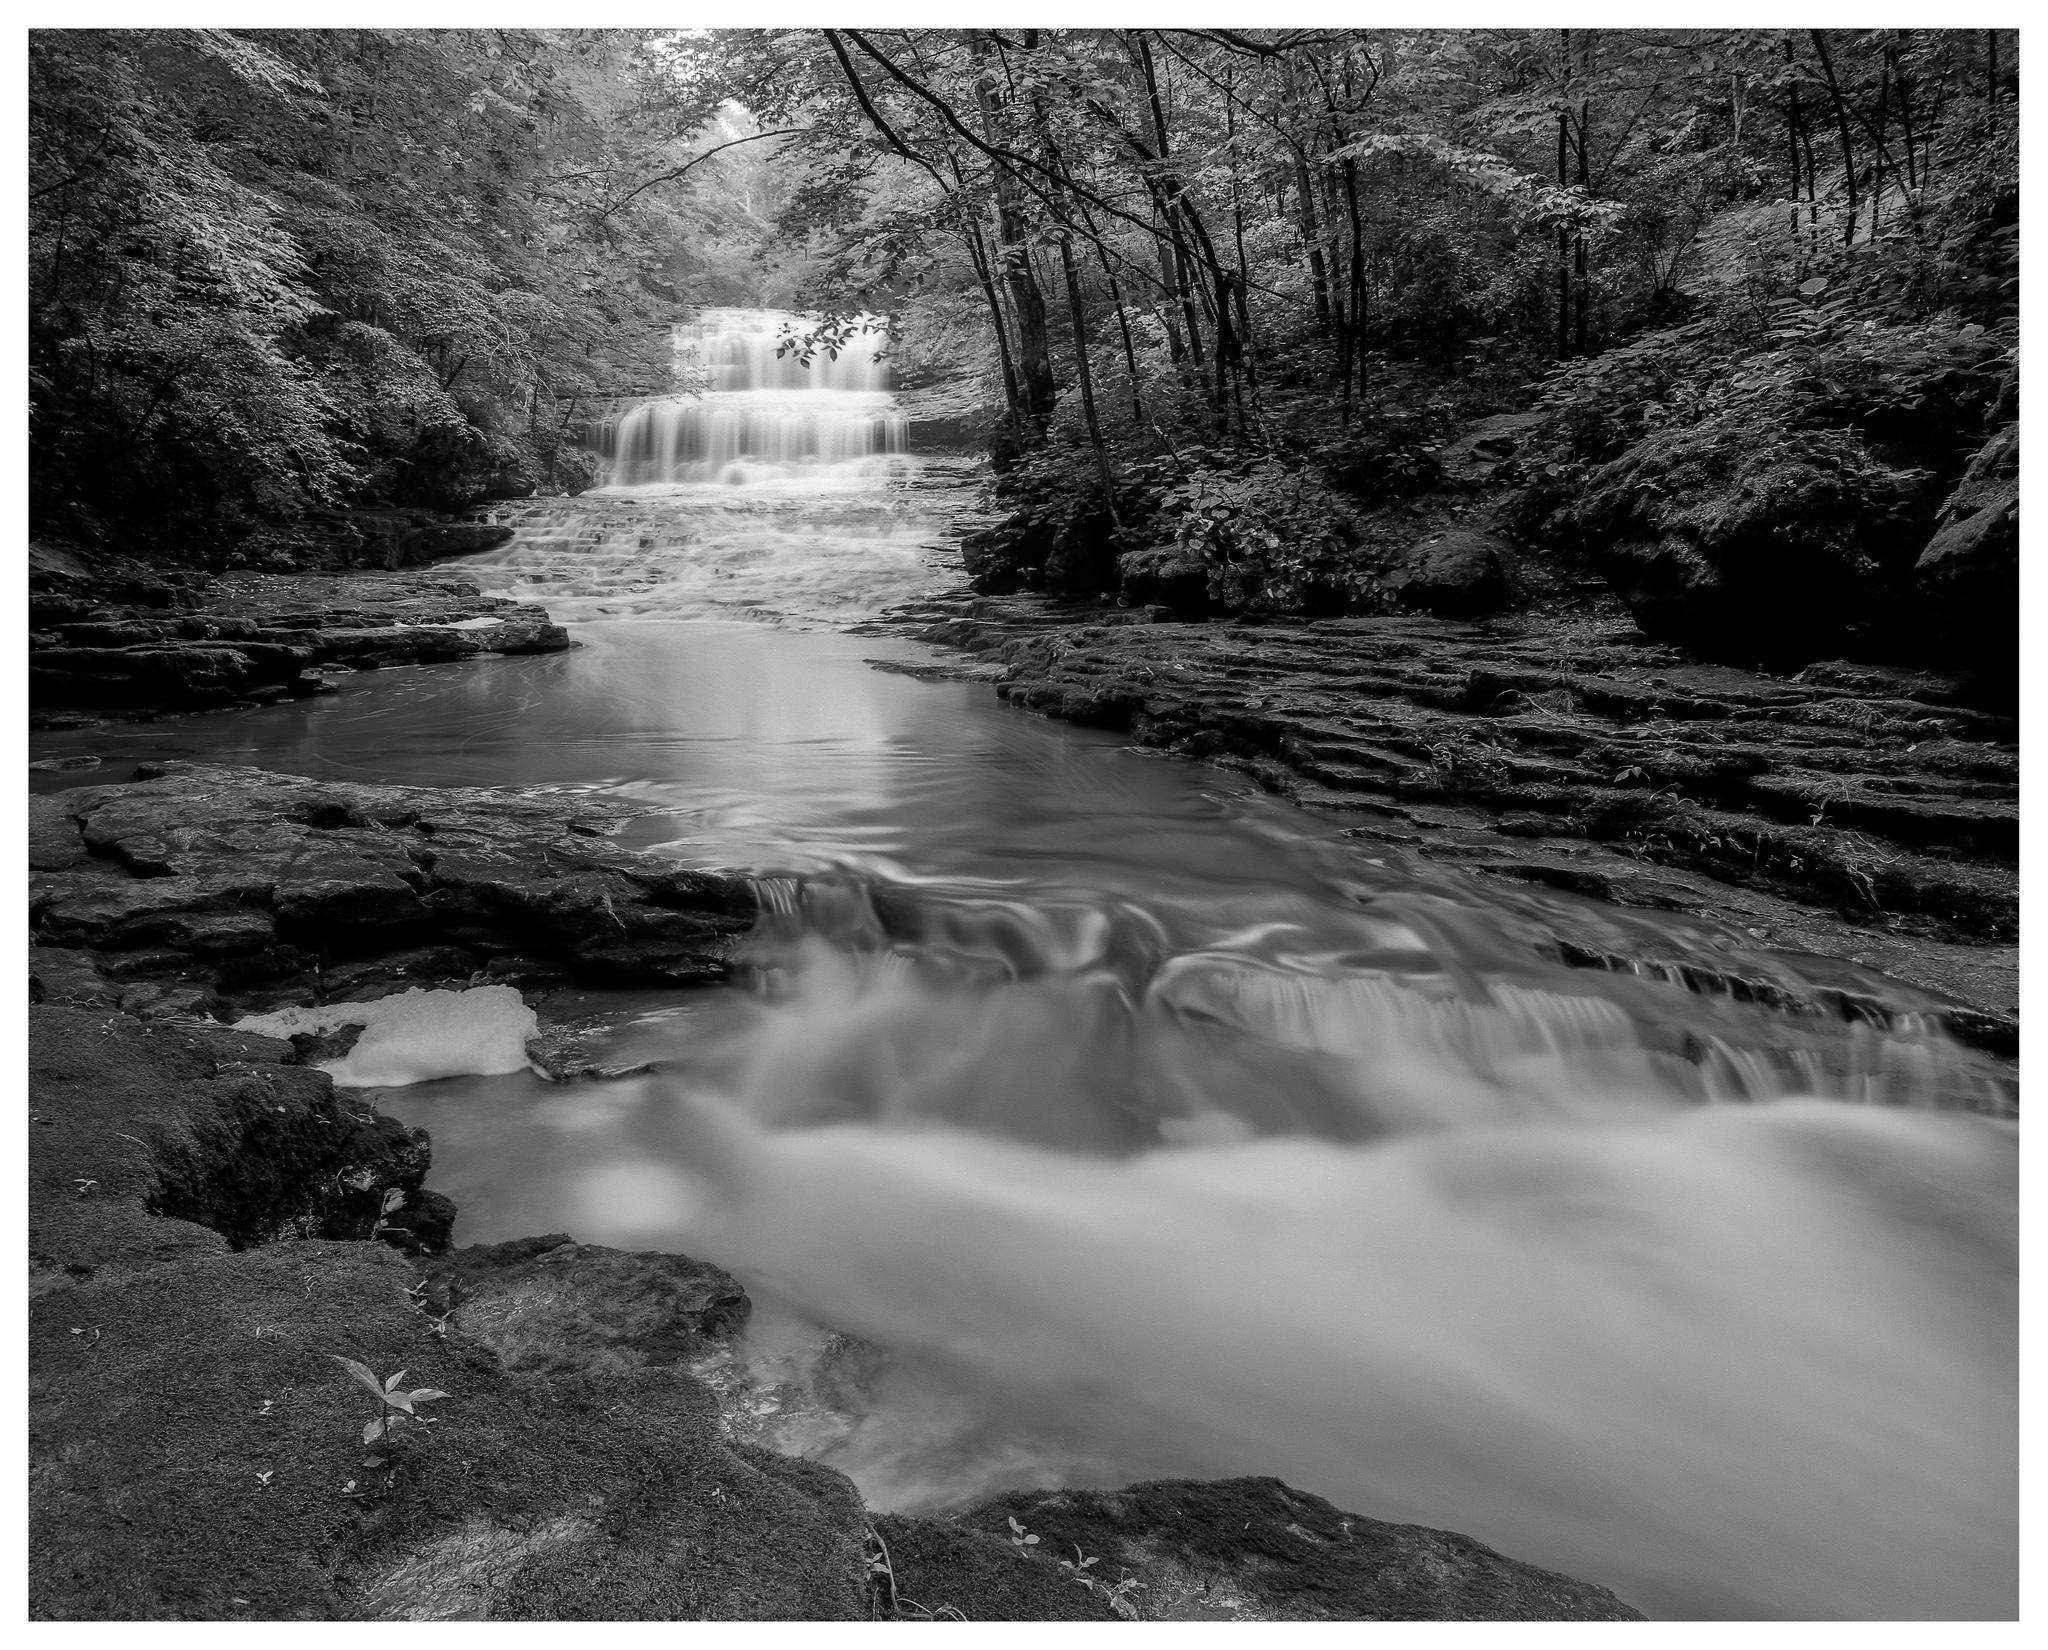 Fallsville Falls – Mamiya RB67 ProS w/50mm lens, polarizer, and 4-stop ND filter on Kodak Tmax 100 film @ f/16, 45 seconds